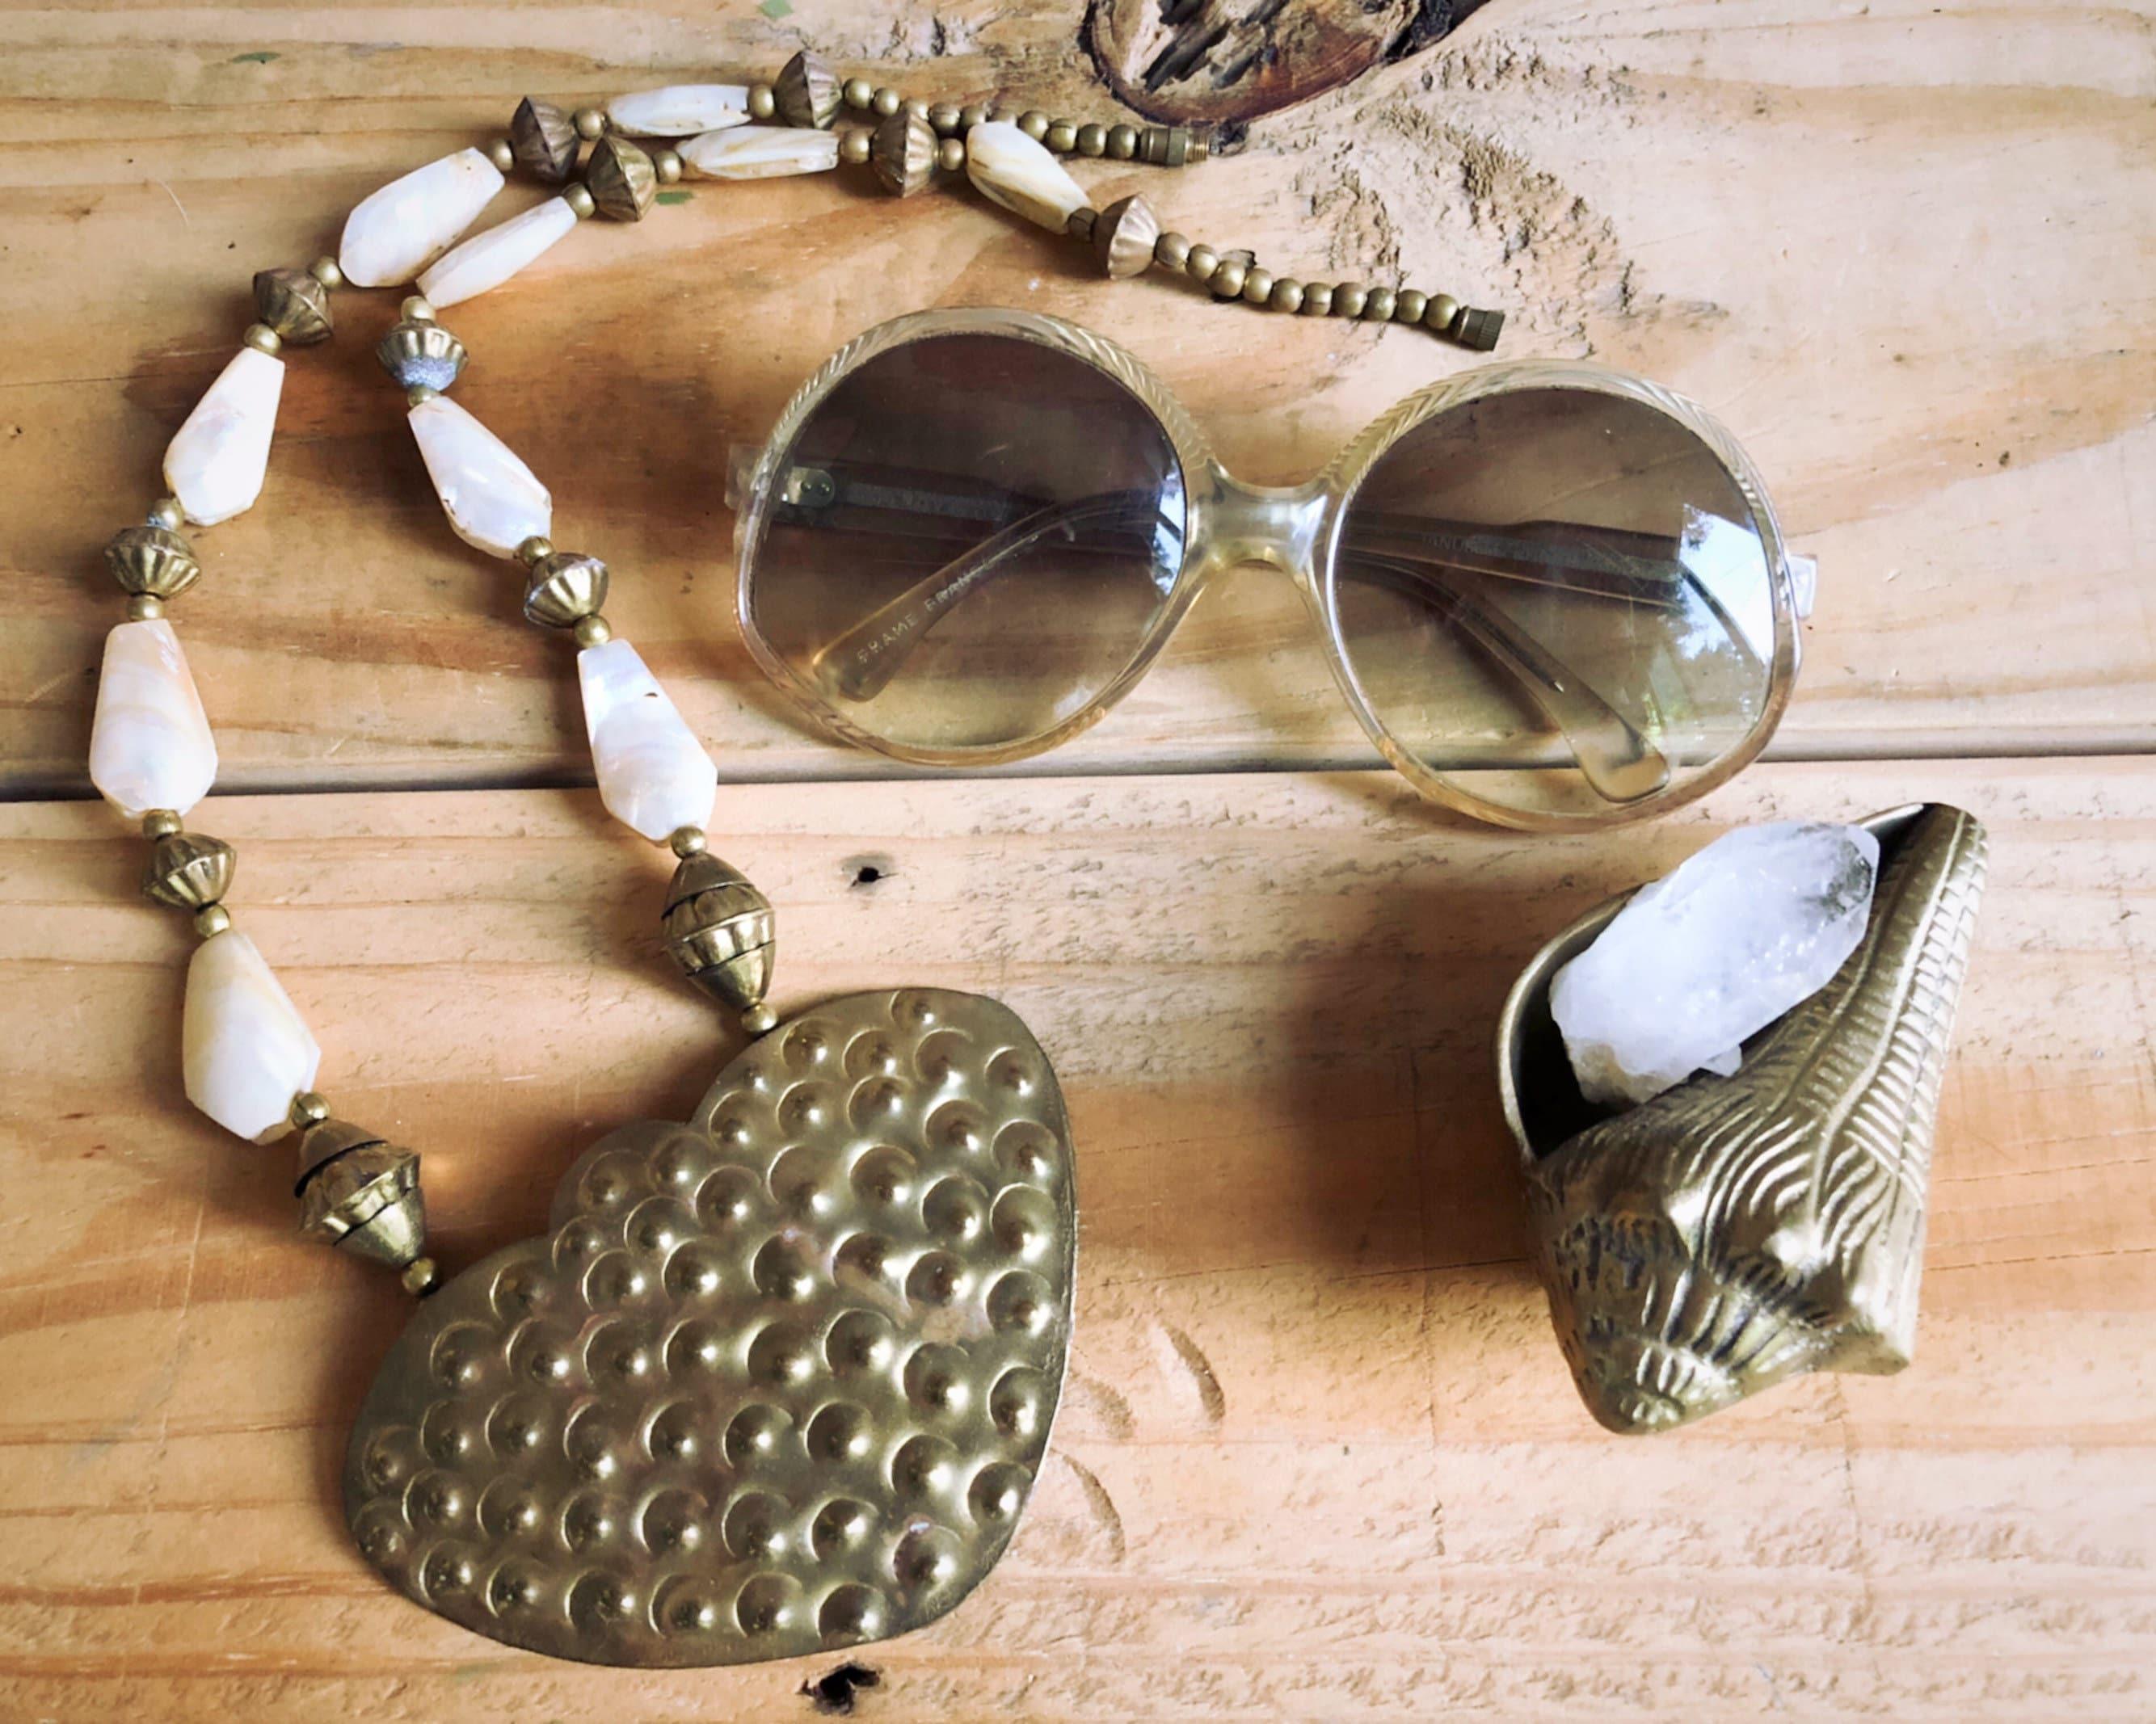 b8b8c9c7d0f Emmanuelle khahn vintage designer sunglasses made in paris etsy emmanuel  kahn sunglasses paris jpg 2668x2134 Emmanuel